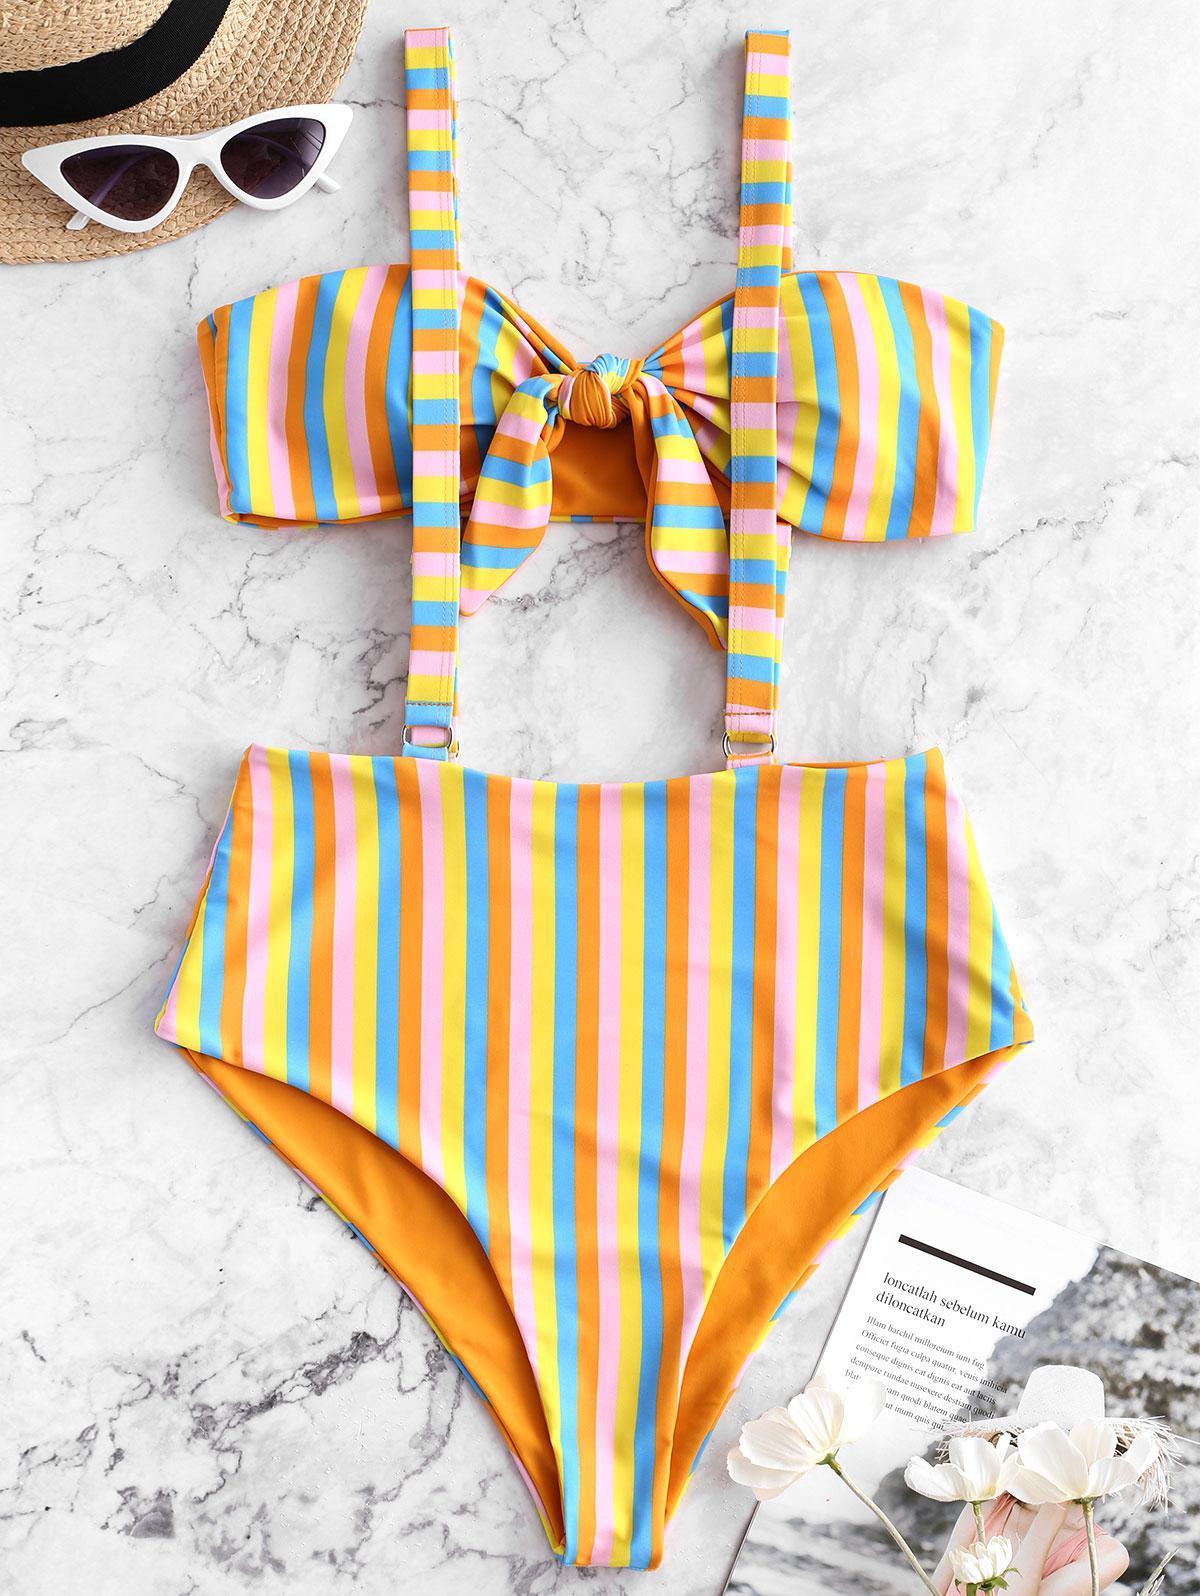 ZAFUL Knotted Striped Reversible Suspender Bikini Swimsuit thumbnail